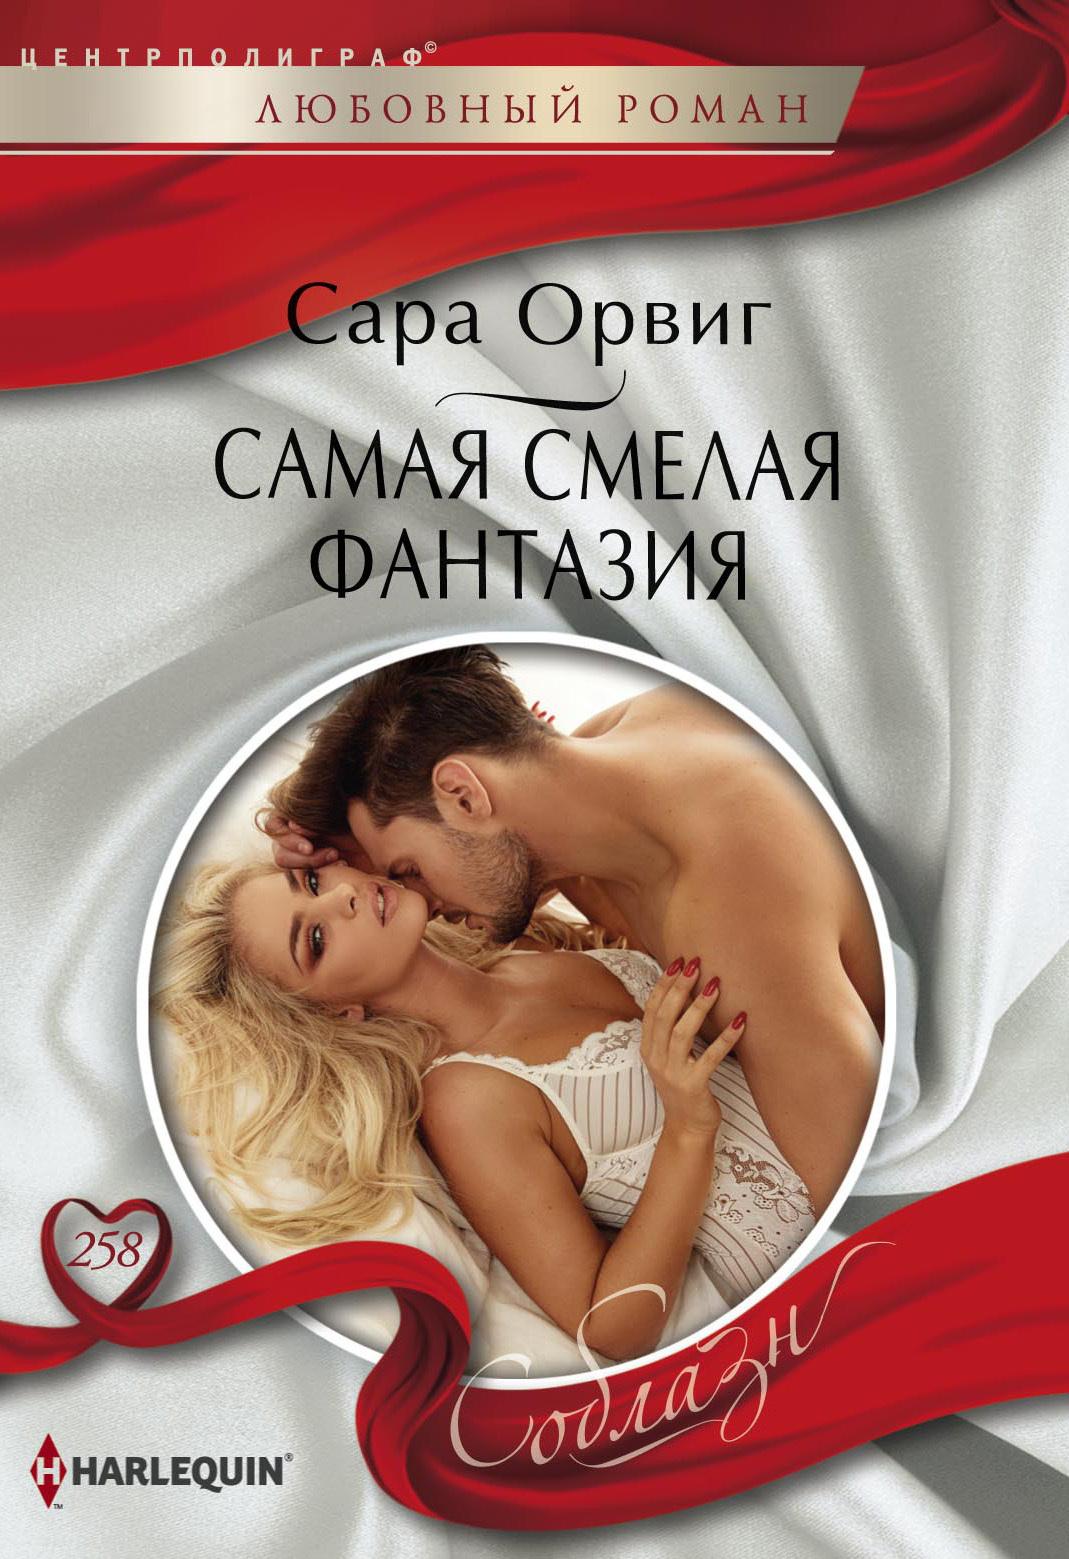 fantazii-ya-snimayu-s-tebya-trusiki-anal-porno-foto